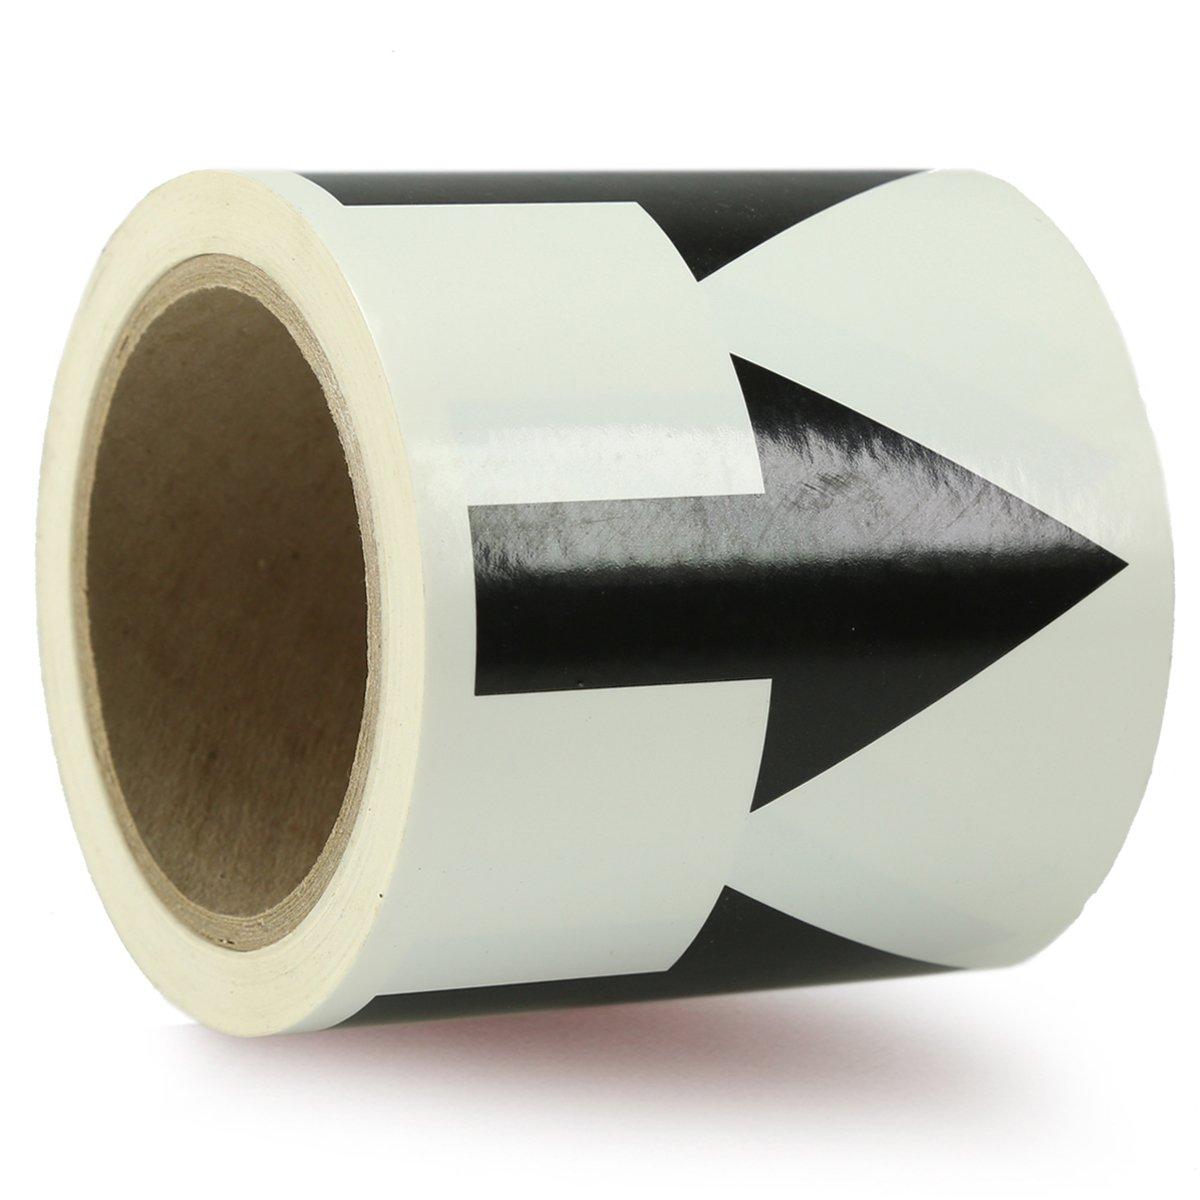 Accuform Signs RAW258BKWT Vinyl Directional Flow Arrow Tape, Black Arrow on White, 4